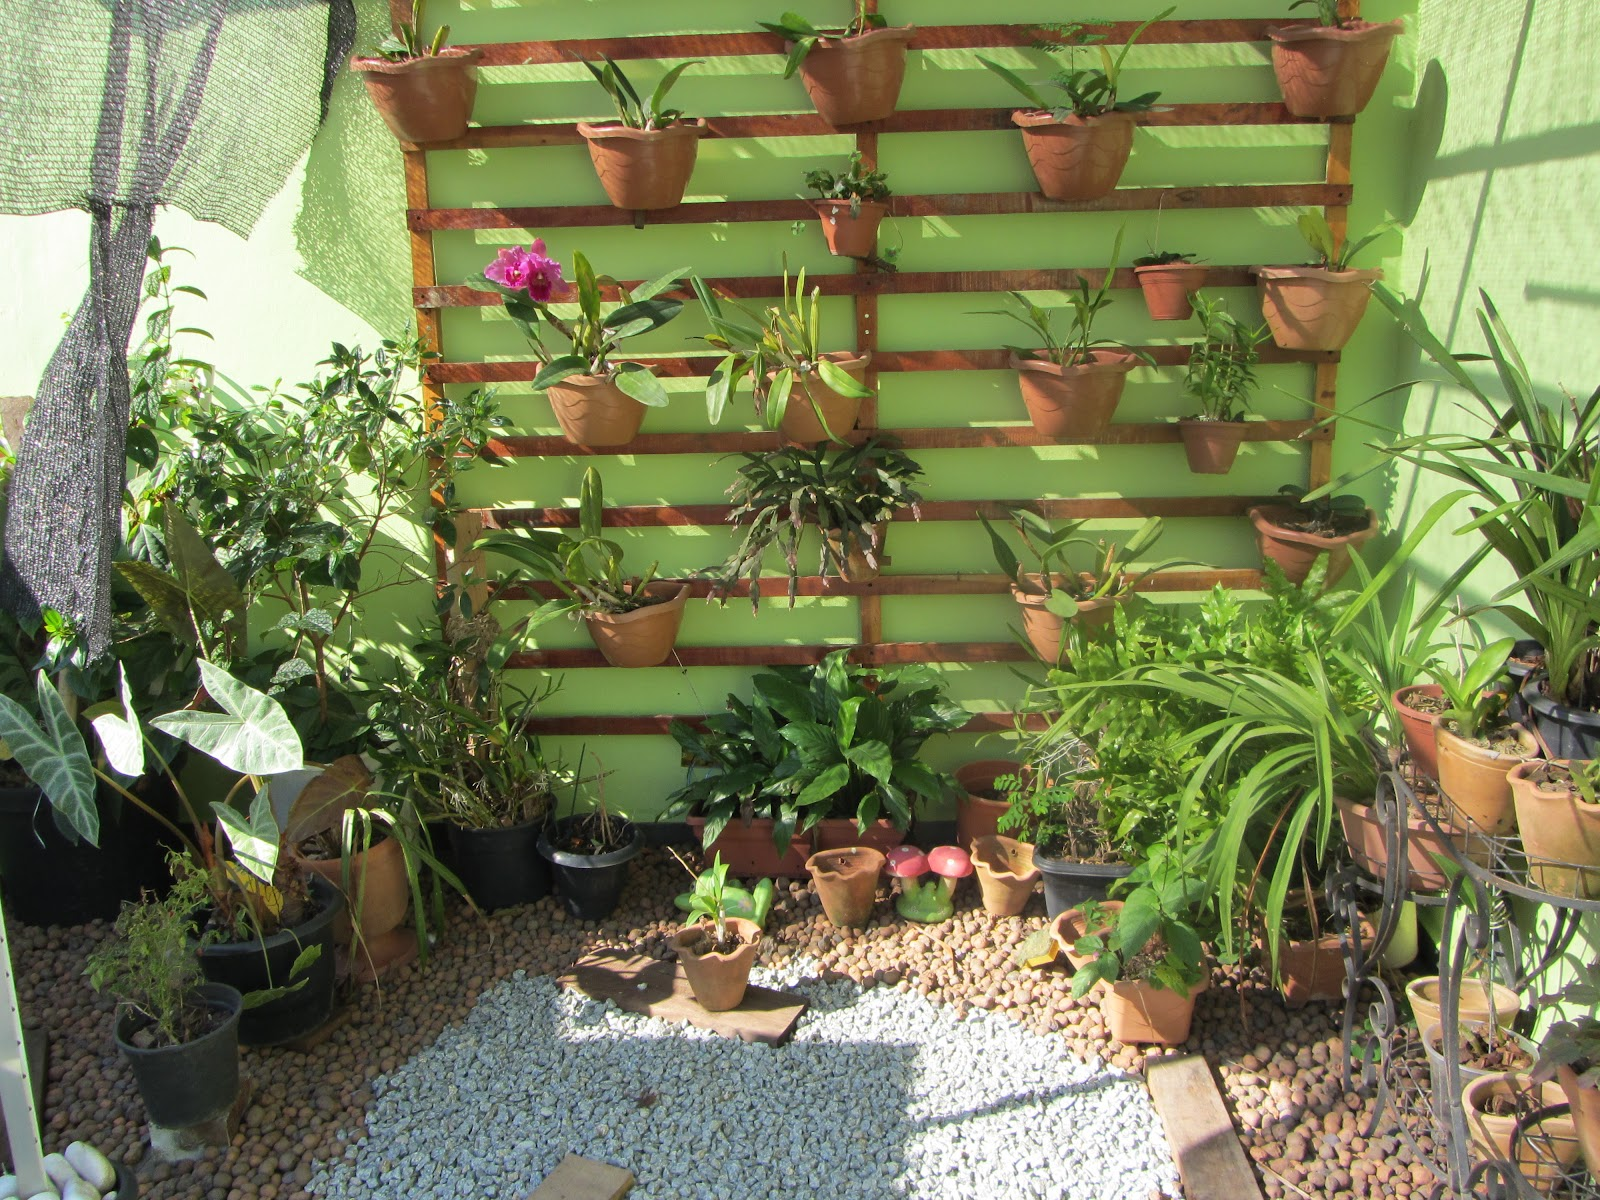 ideias para decorar meu jardim: -jardim-flores-vasos-equipamentos-para-dicas-6-jardim-de-inverno.jpg